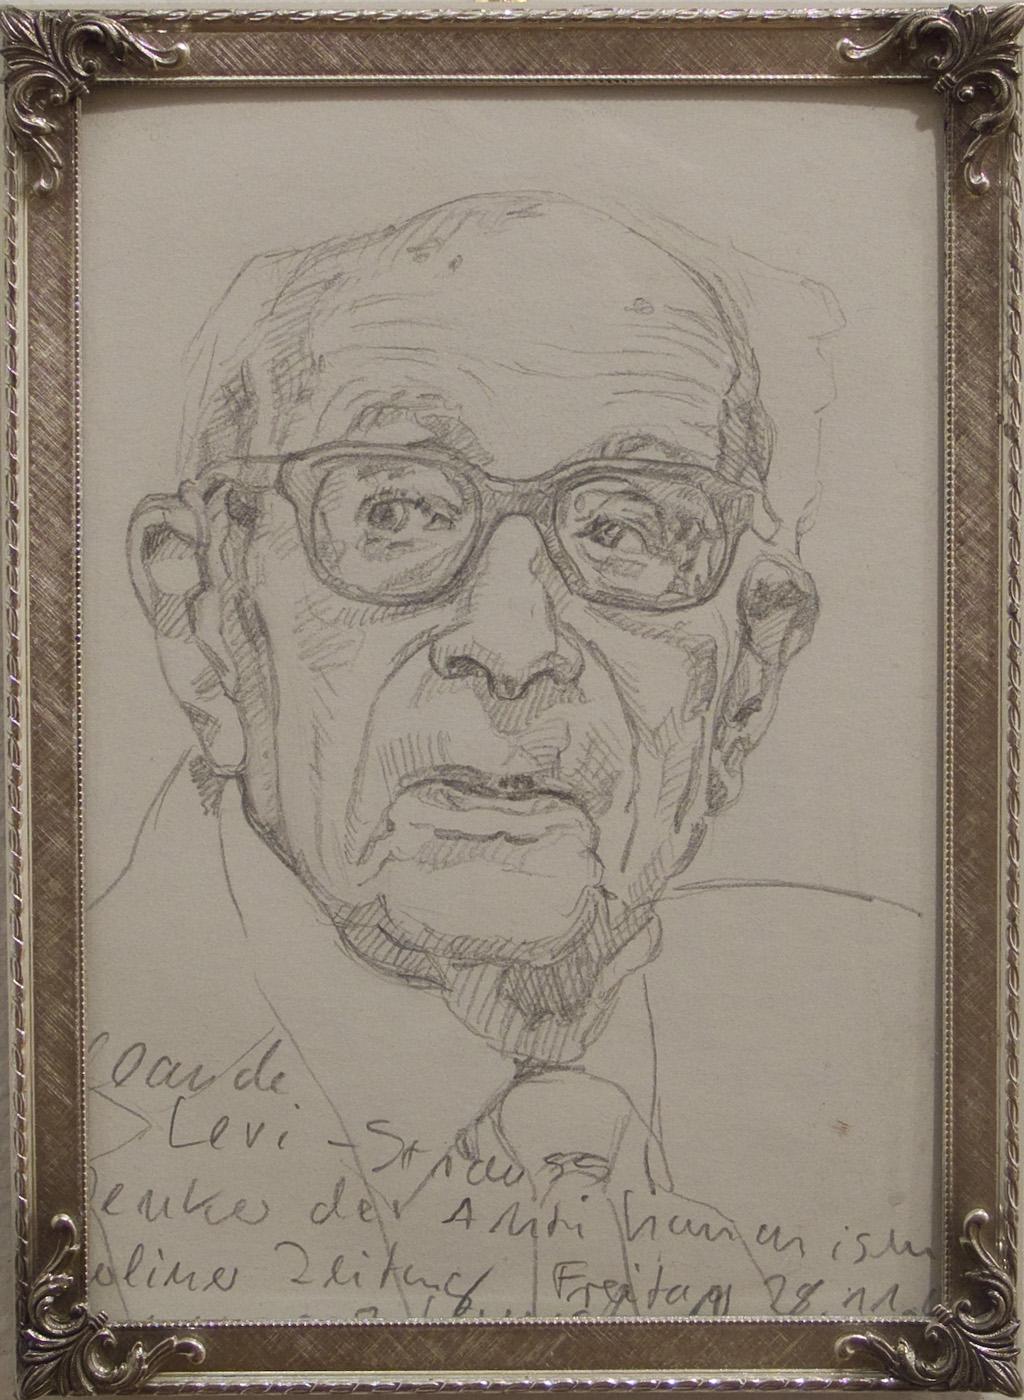 Ulrich Lamsfuss   Claude Levi-Strauss. Denker des Anti-Humanismus (Berliner Zeitung, Freitag, 28.11.2008) , 2009 Pencil on paper, vintage frame 5 1/4 x 7 1/4 inches 13.3 x 18.4 cm